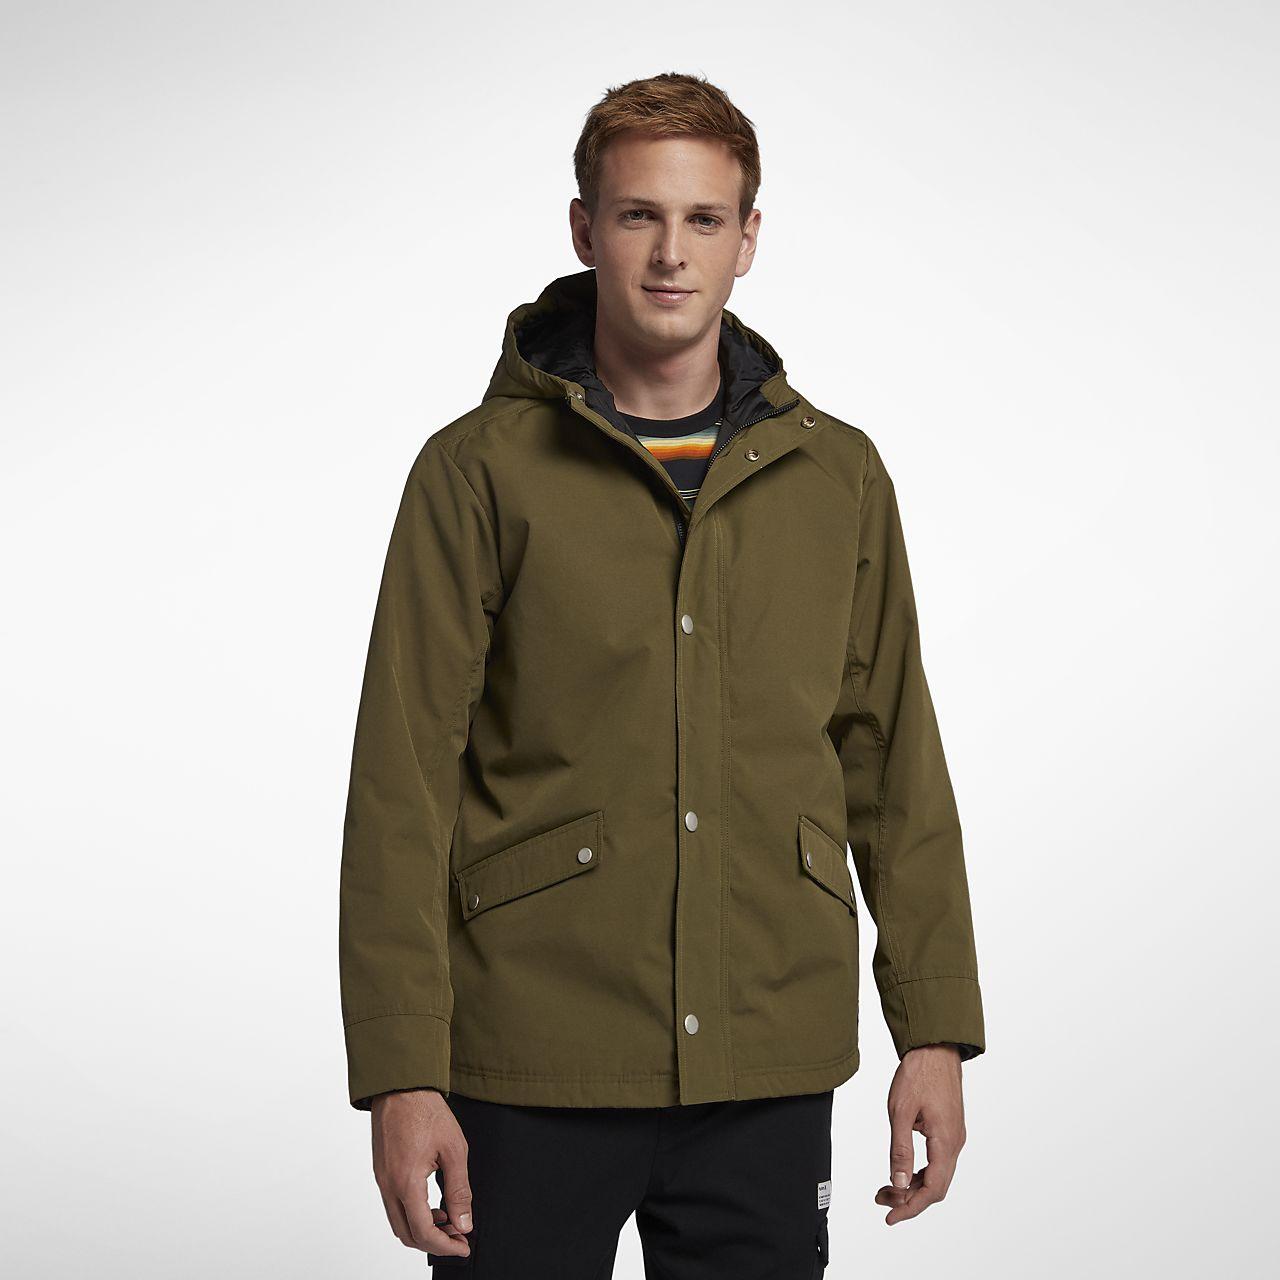 3075a568e56a Мужская куртка с капюшоном Hurley Timber. Nike.com RU